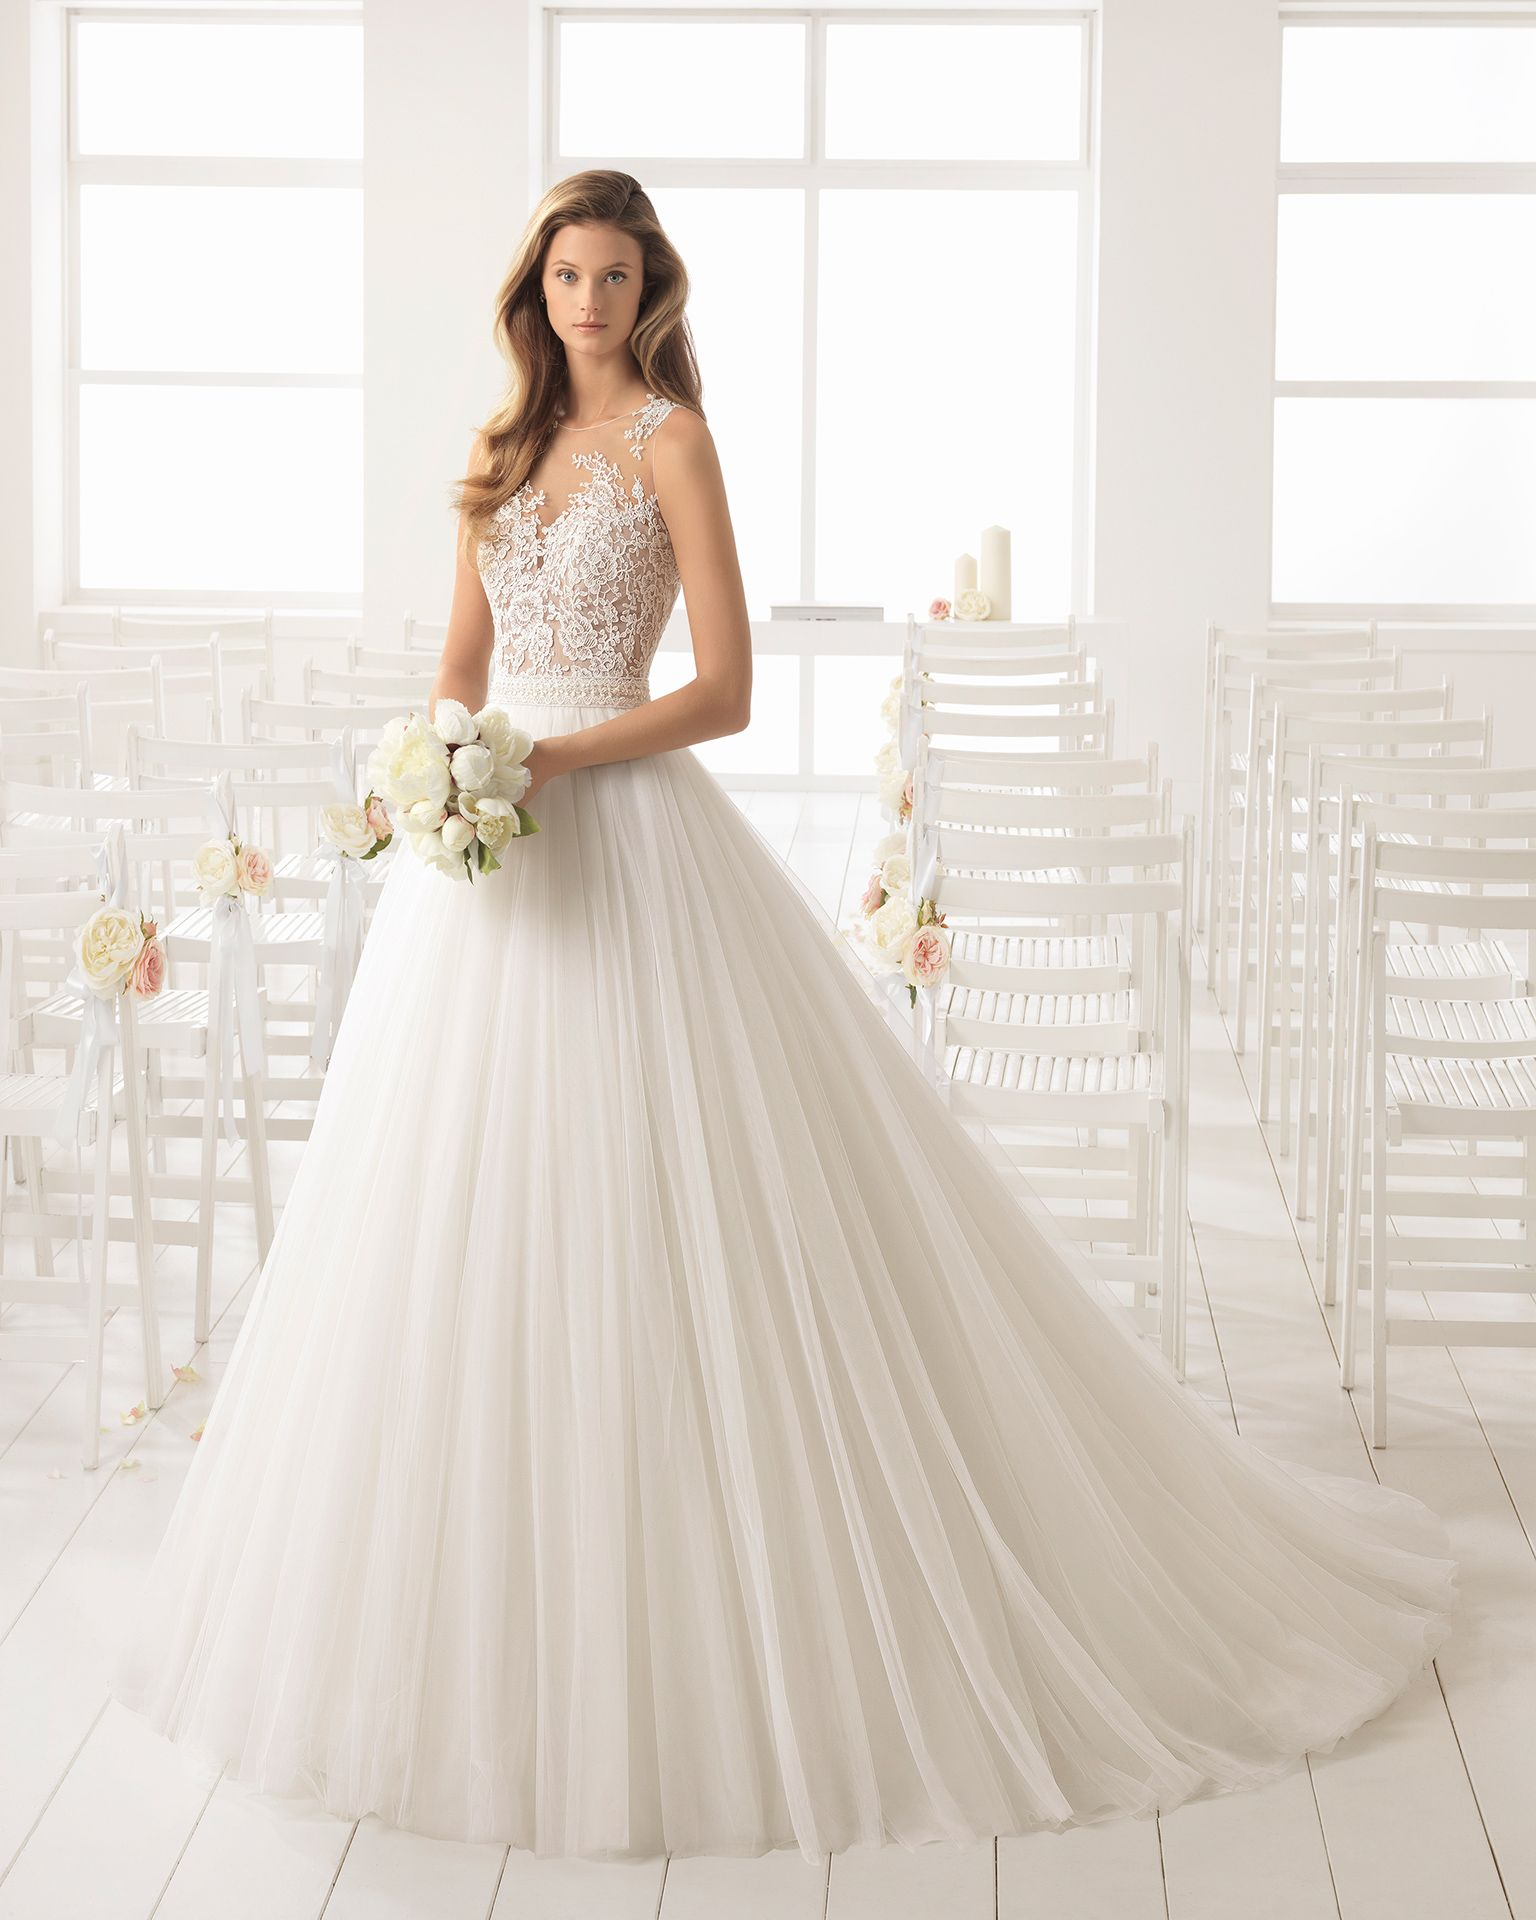 3be93b3c9 Vestido de novia estilo línea A en tul